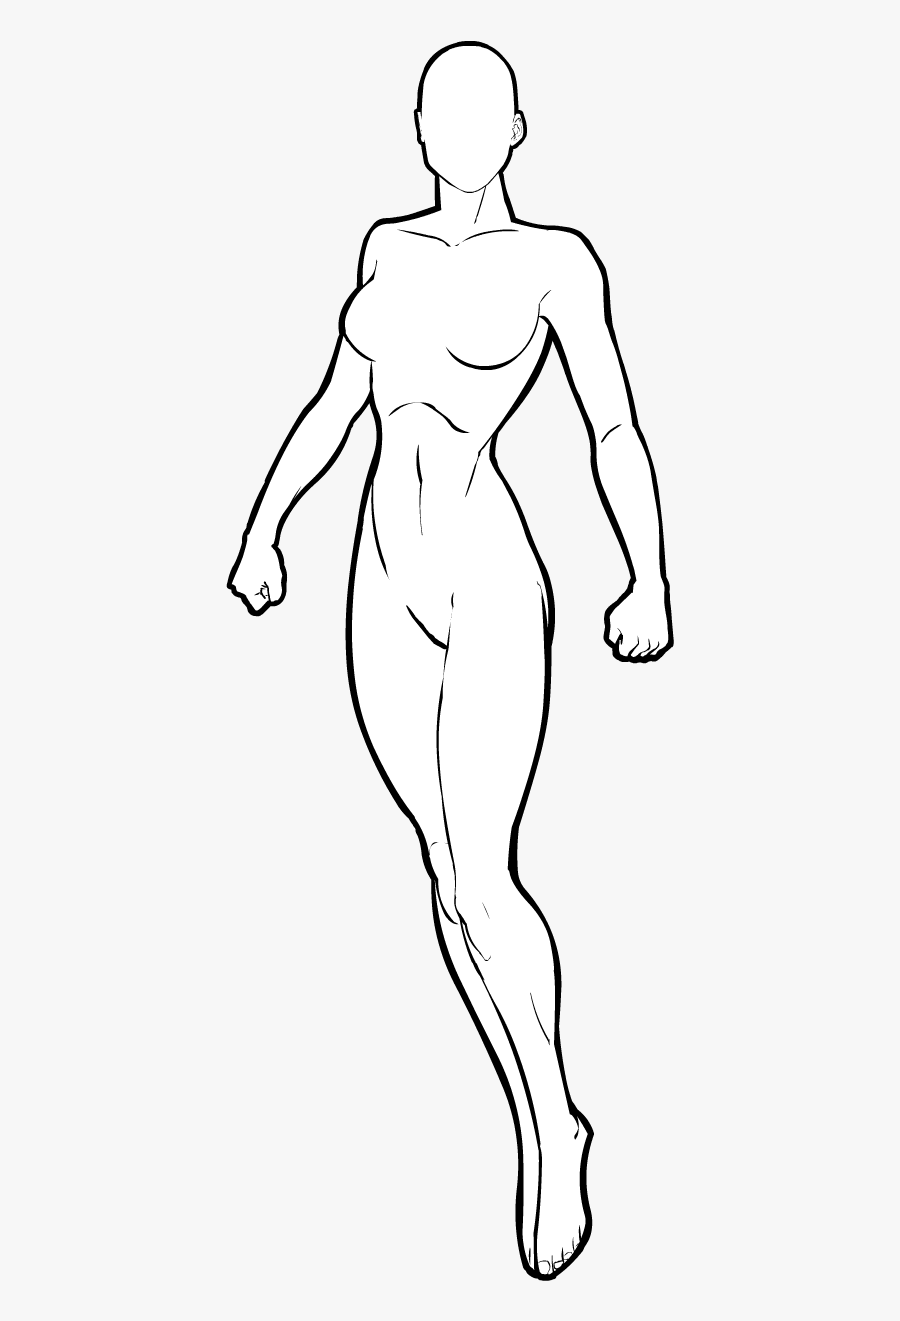 Clip Art Female Superhero Template B - Female Superhero Girl Superhero Template, Transparent Clipart